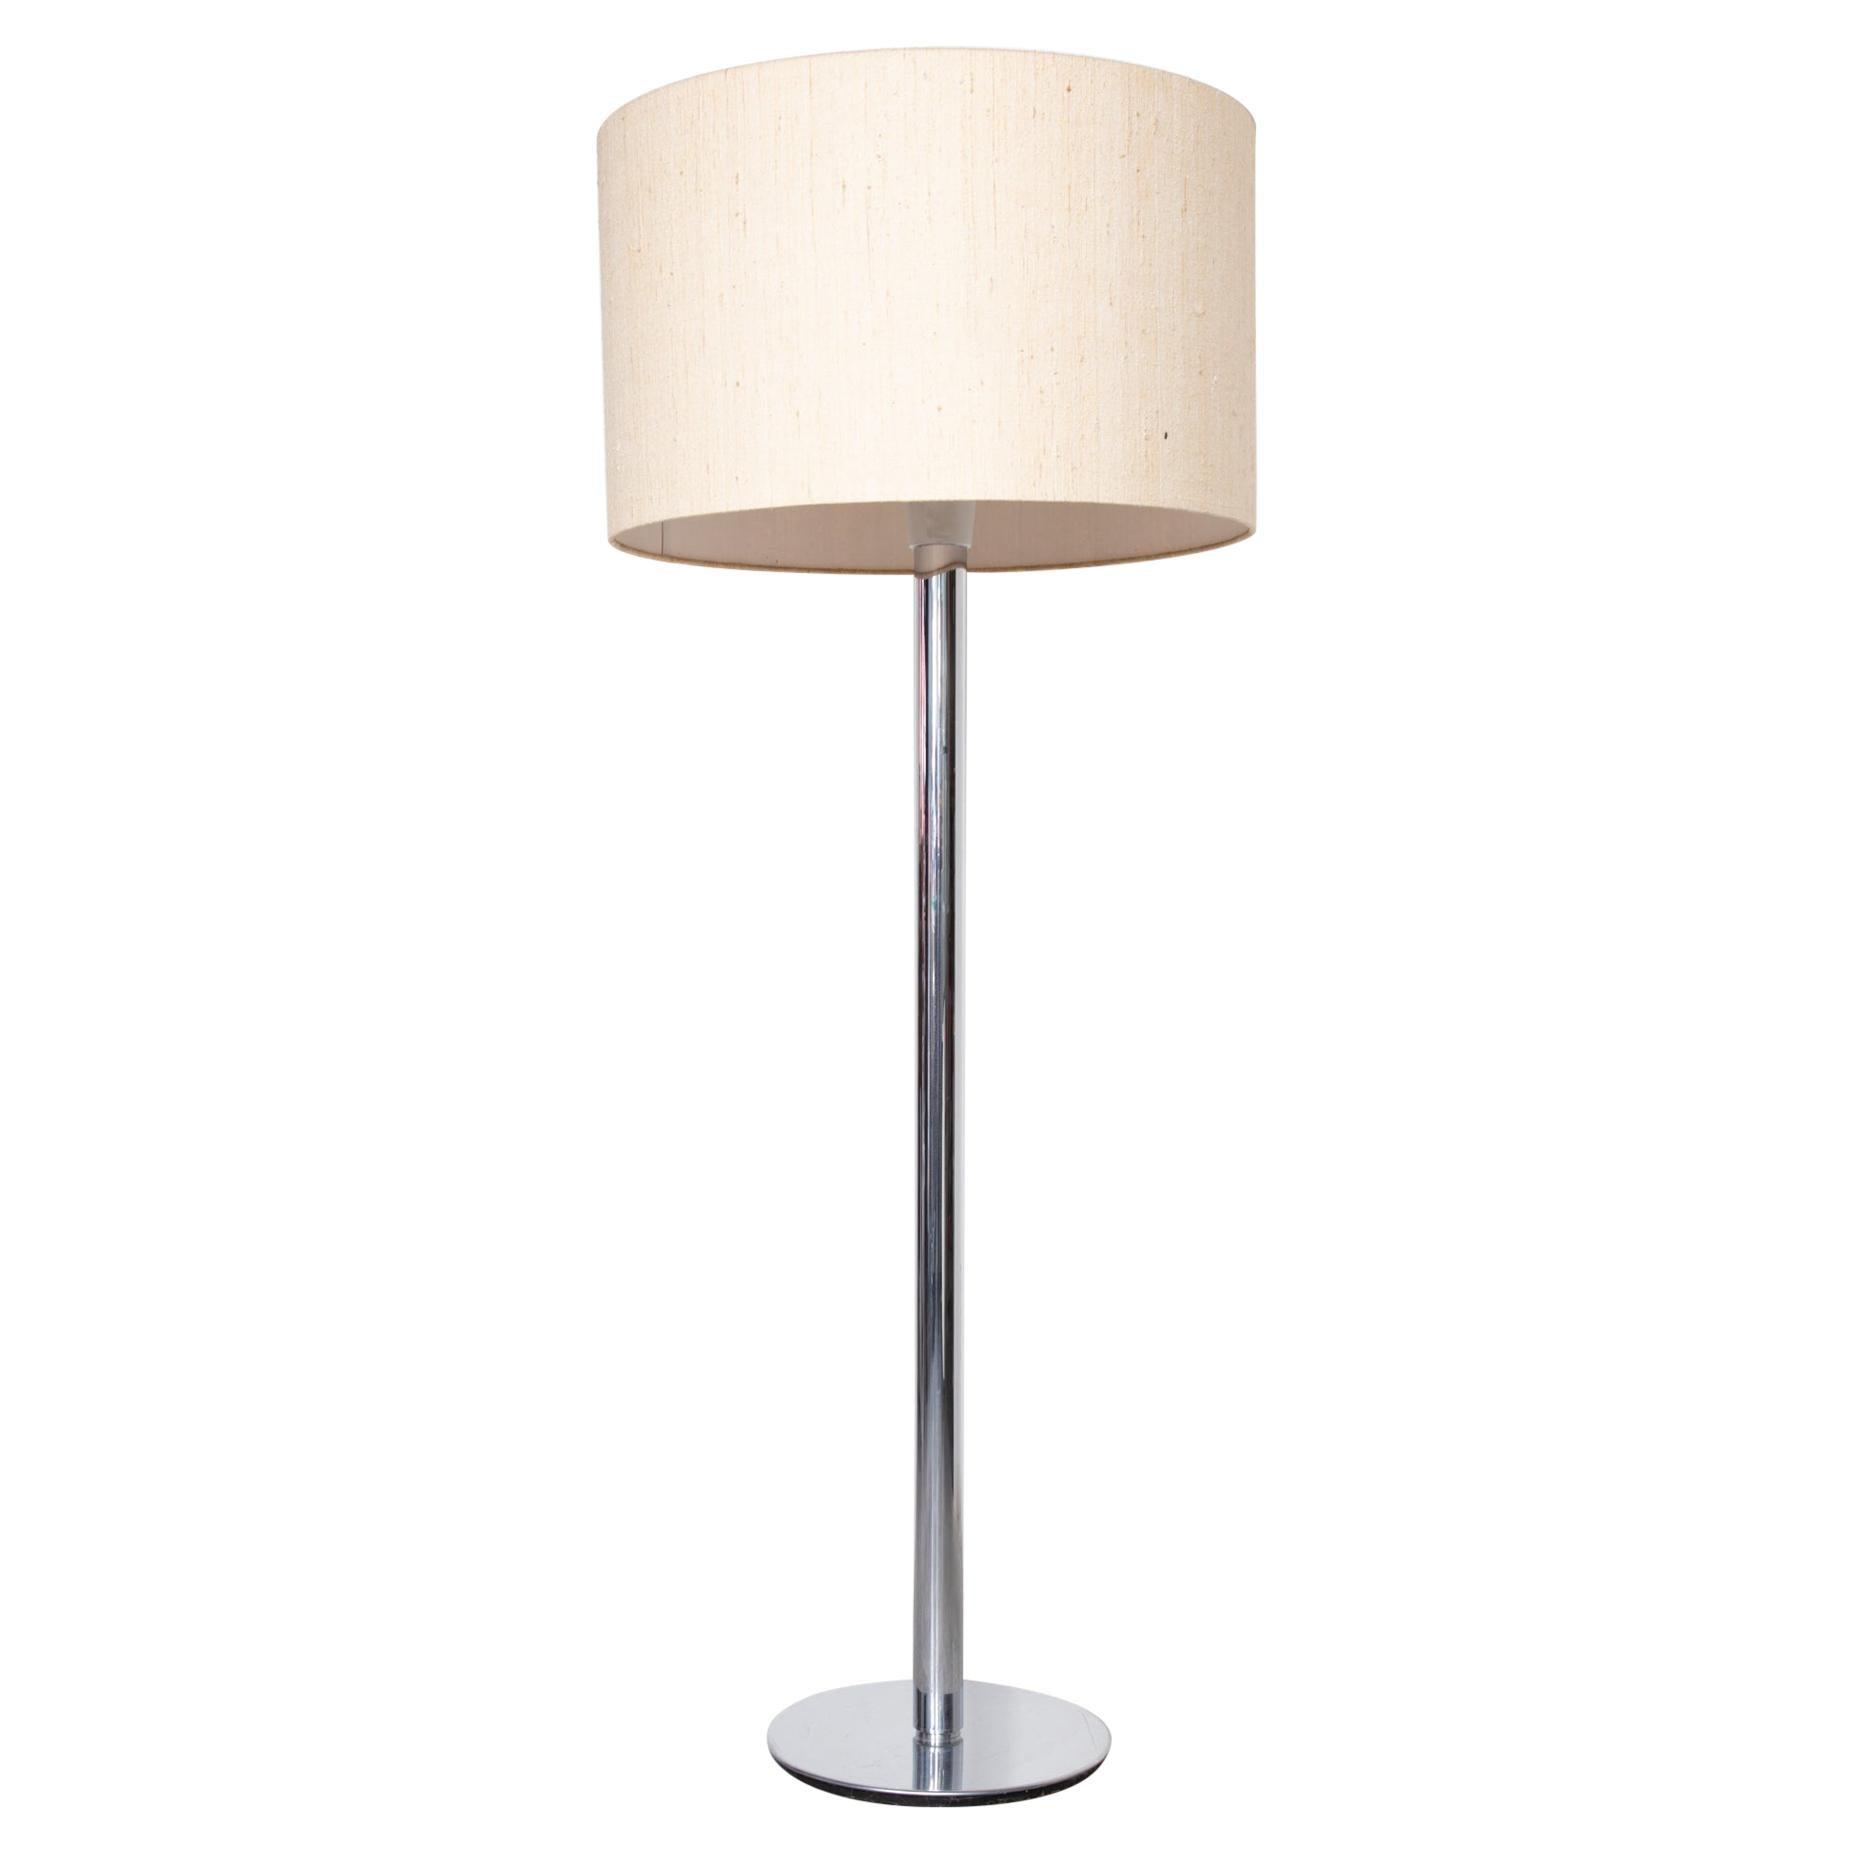 Chrome and Linen Floor Lamp Staff Leuchten, Germany